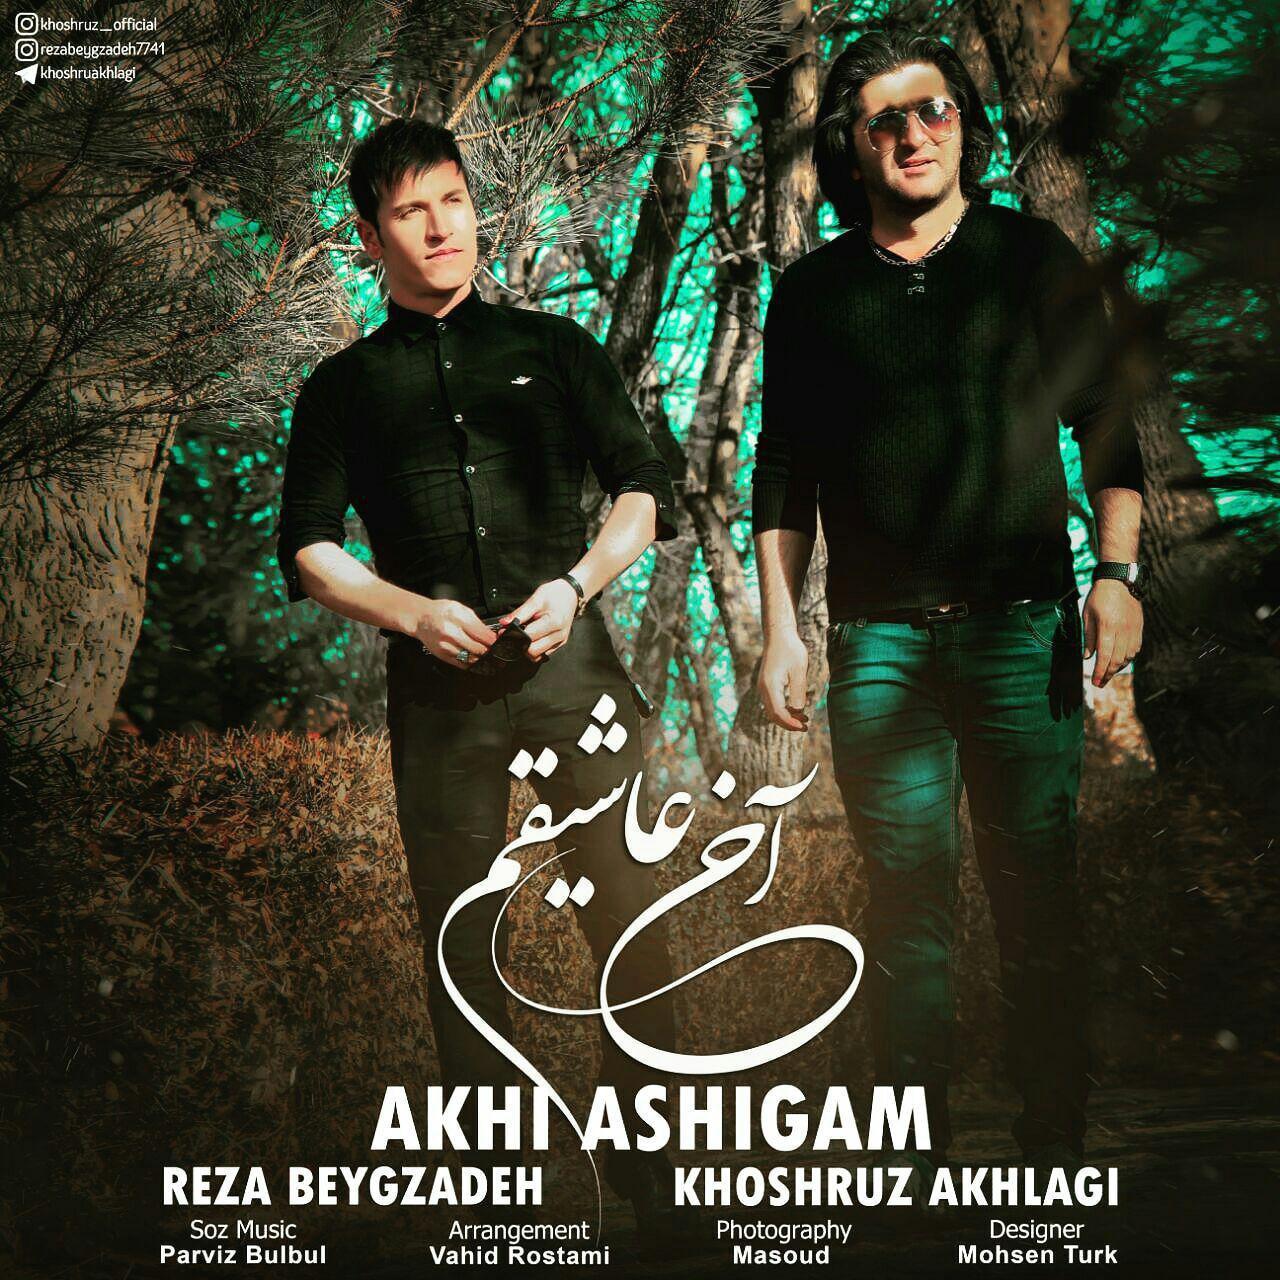 http://s8.picofile.com/file/8317404326/51Khoshruz_Akhlagi_Reza_Beygzadeh_Akhi_Ashigham.jpg